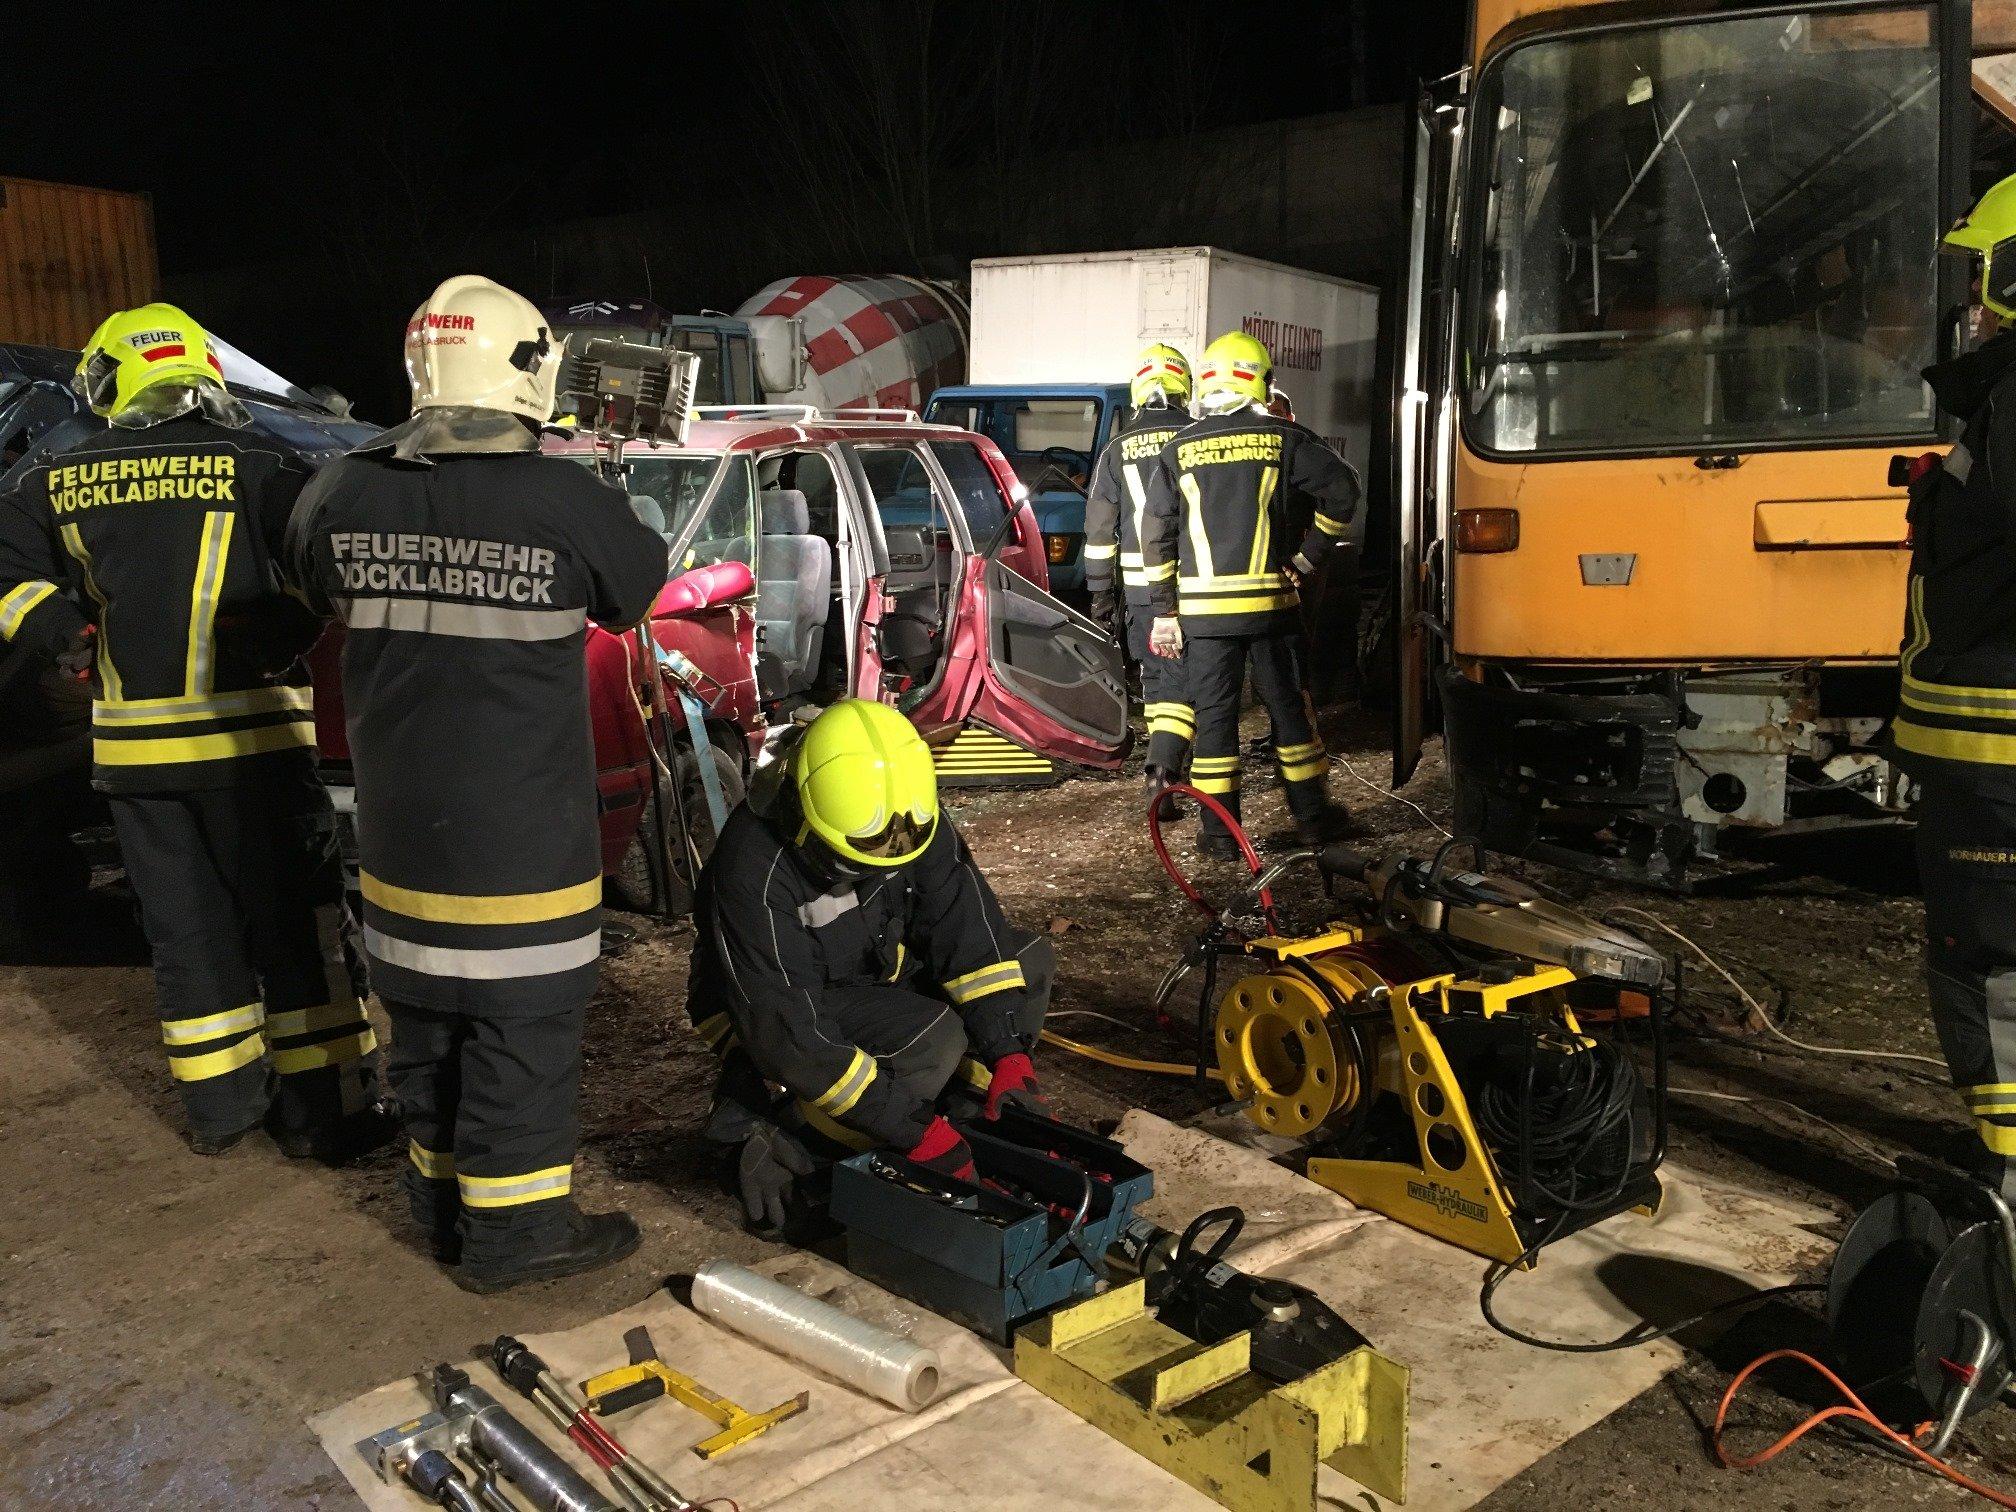 uebungvu 120318 3 - Monatsübung Verkehrsunfall